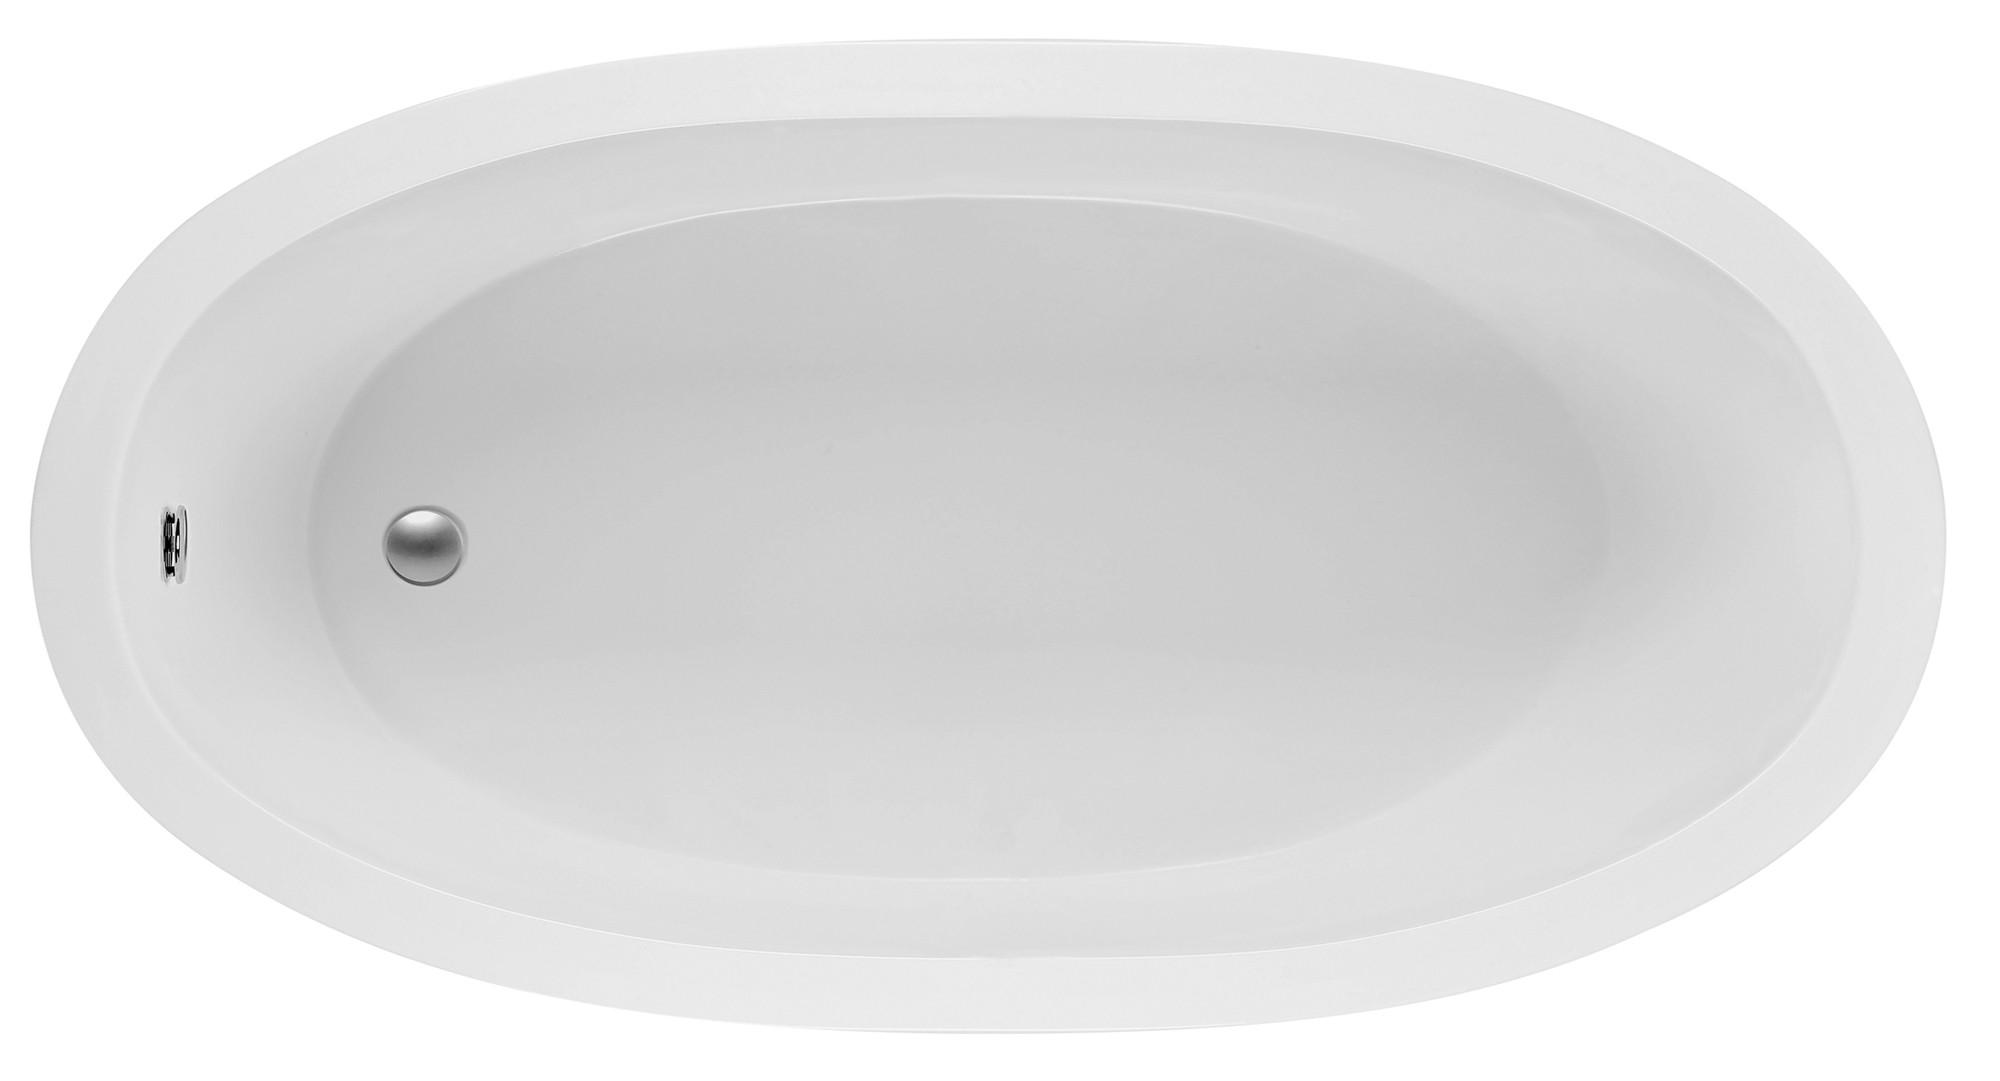 Reliance R7236ODIA 72 Inch Oval End Drain Air Bath